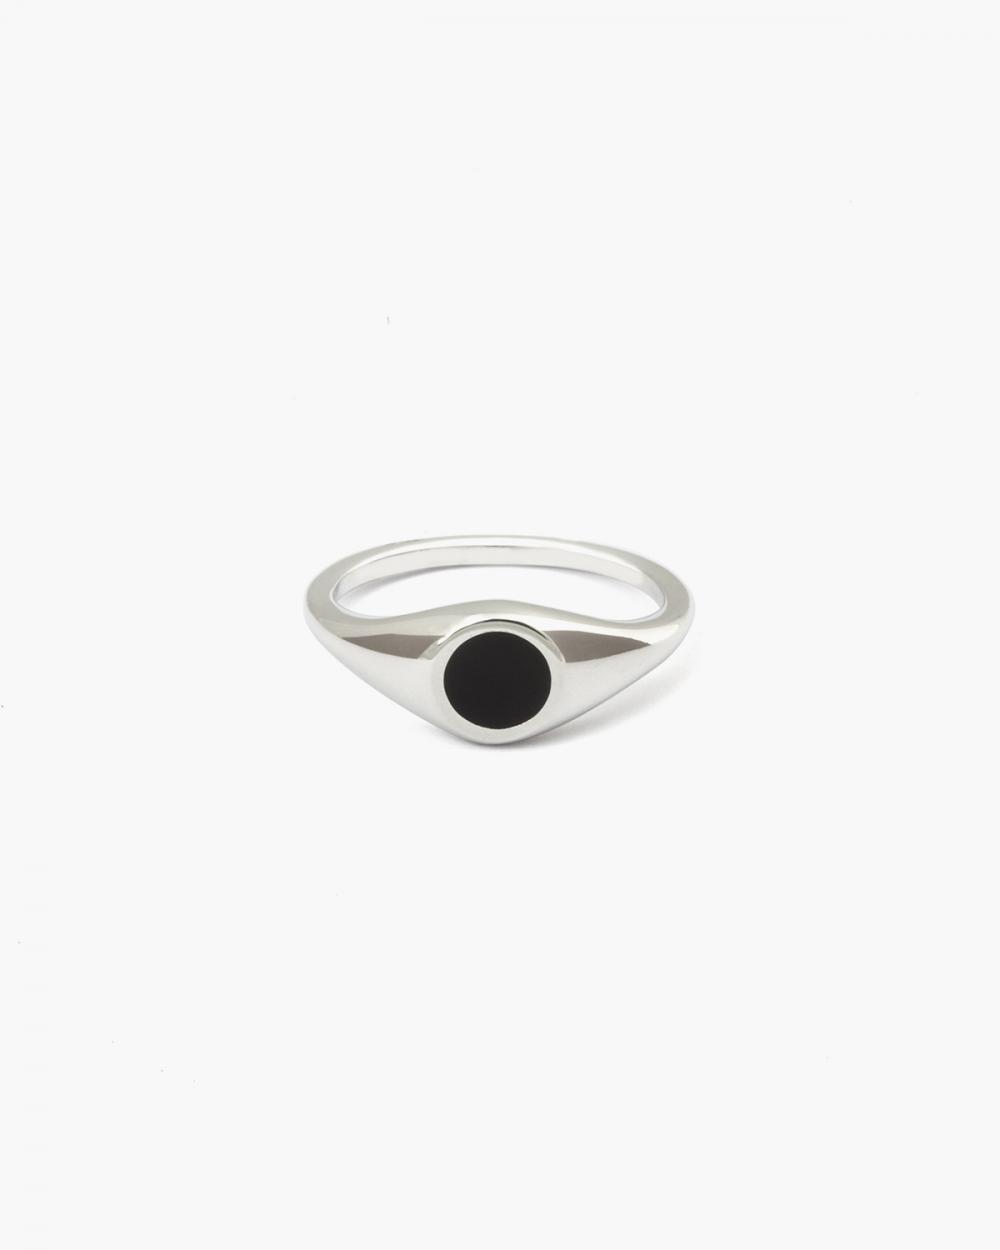 Rings ROUND BLACK ENAMEL SIGNET PINKY RING NOVE25